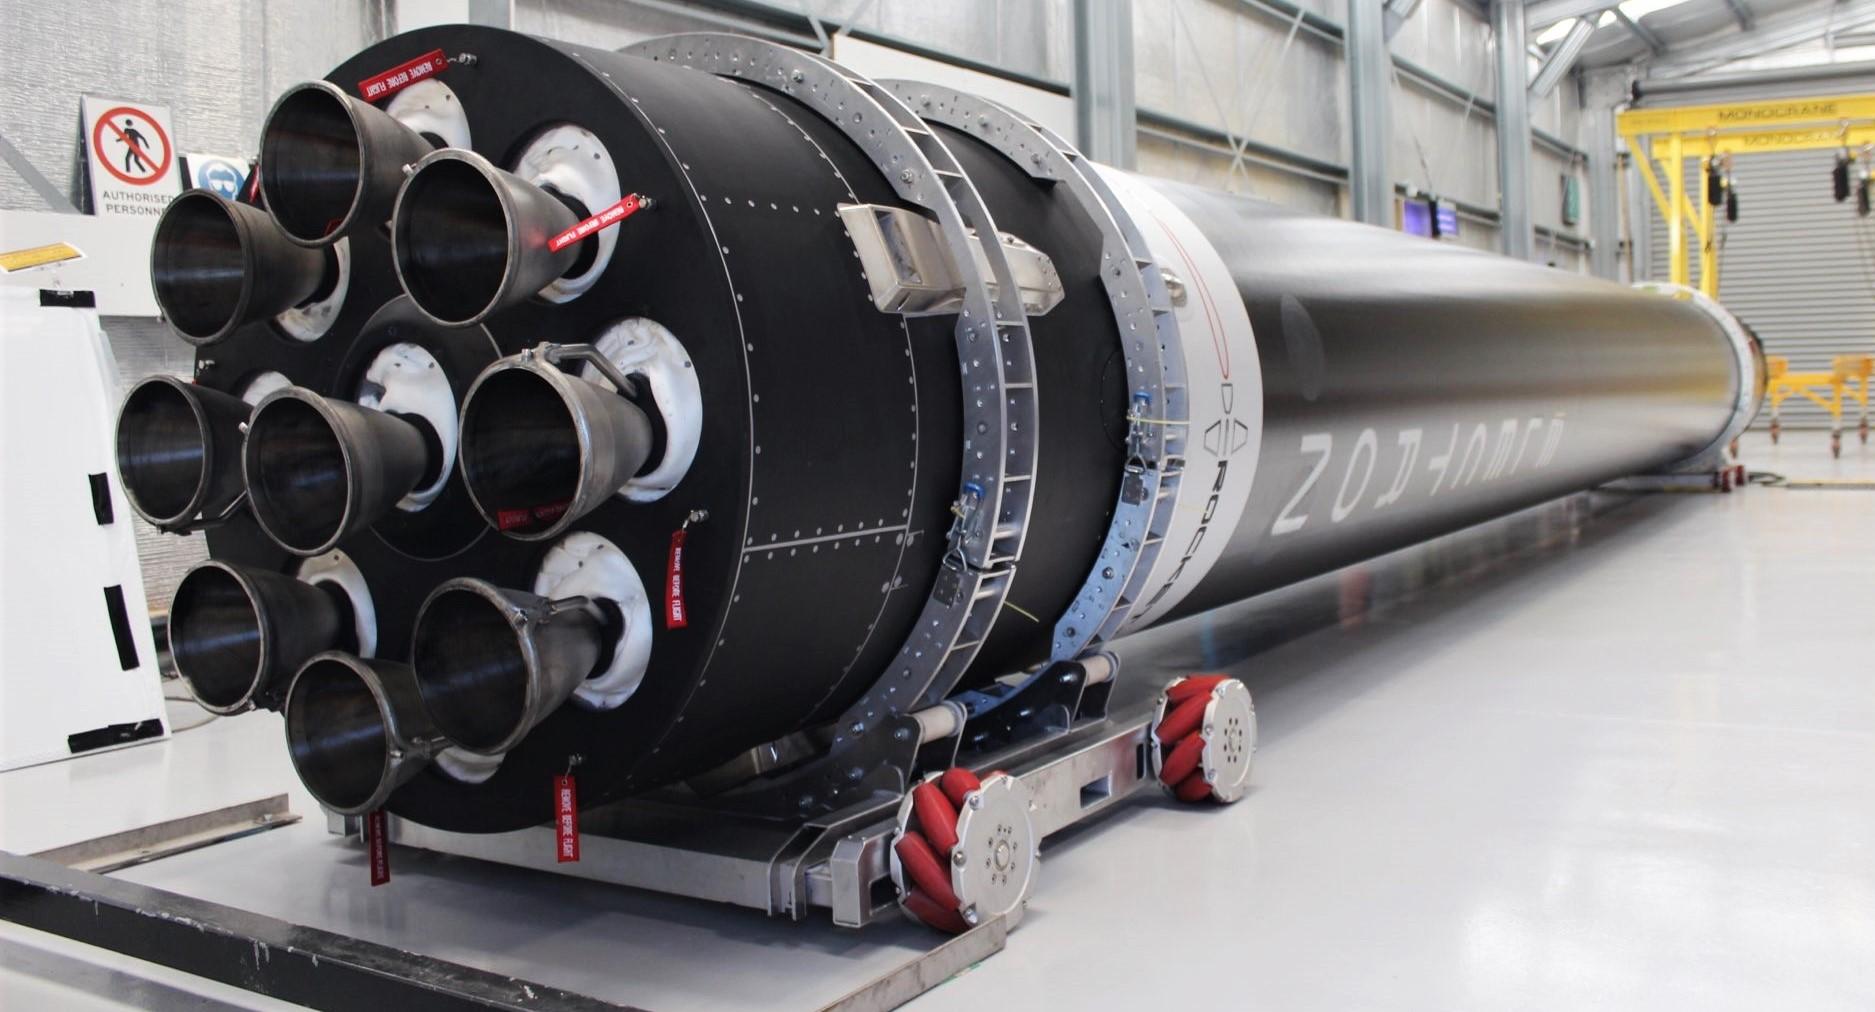 Electron Flight 9 booster LC-1 091219 (Rocket Lab) 1 crop